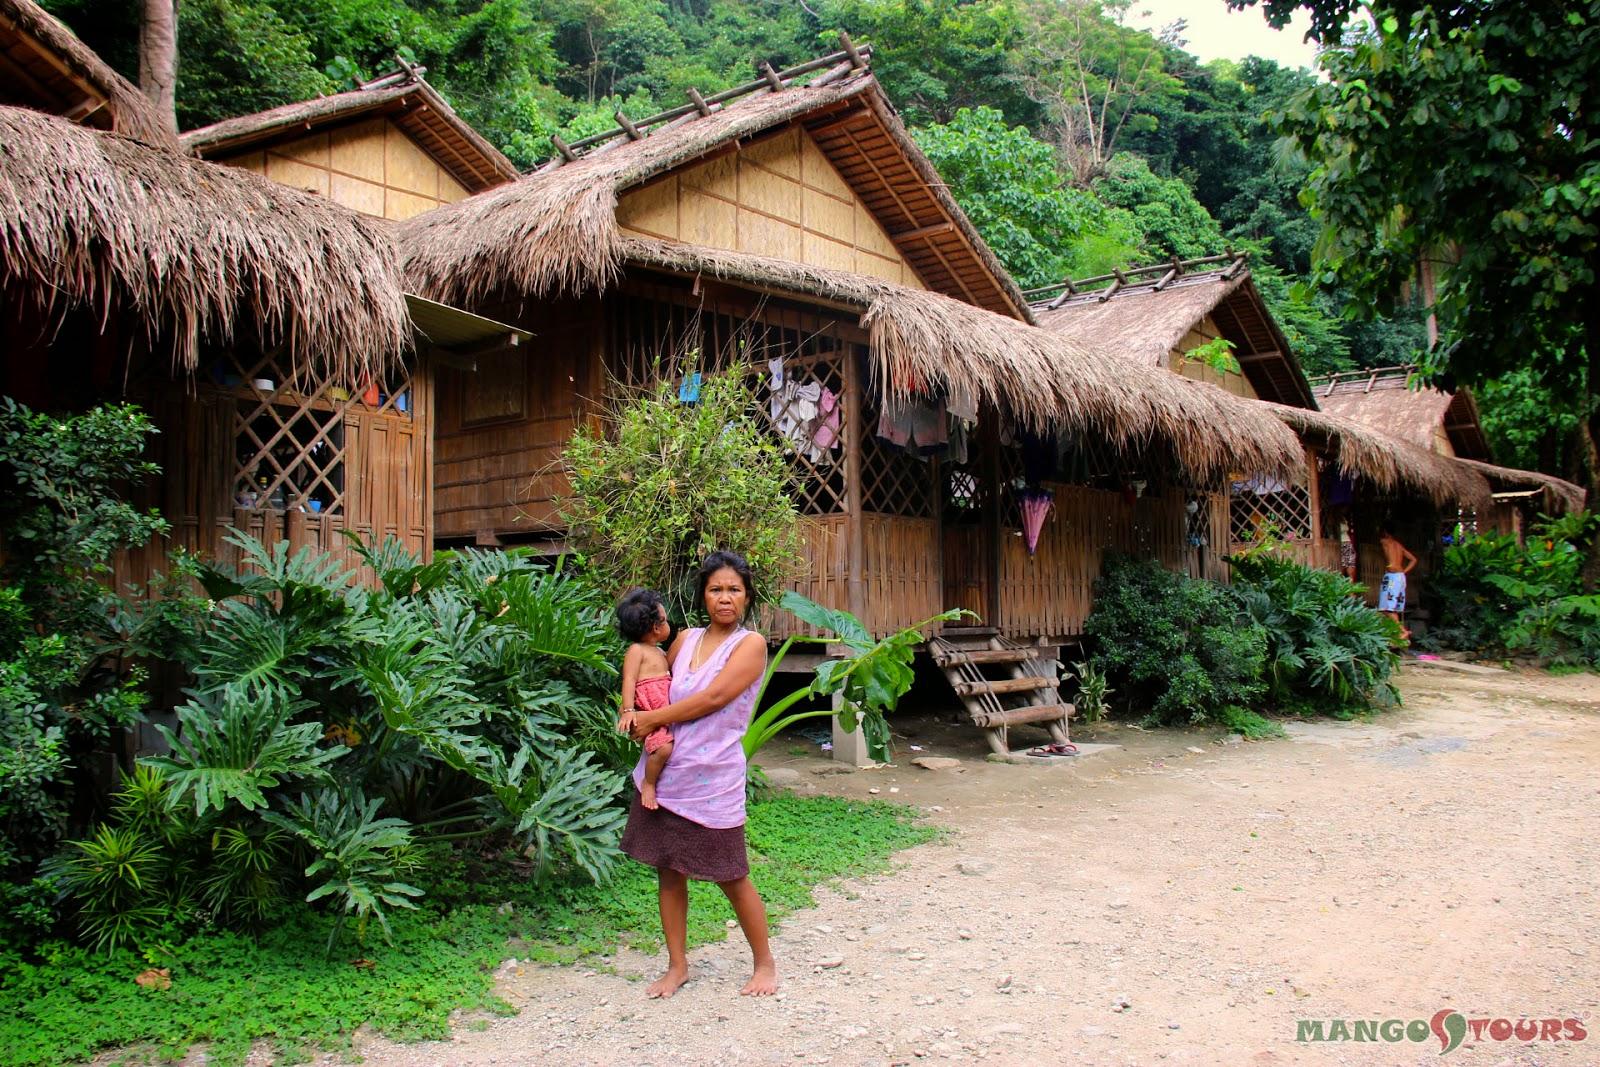 Puerto Galera Buri Resort & Spa Mango Tours Philippines Mangyan Village